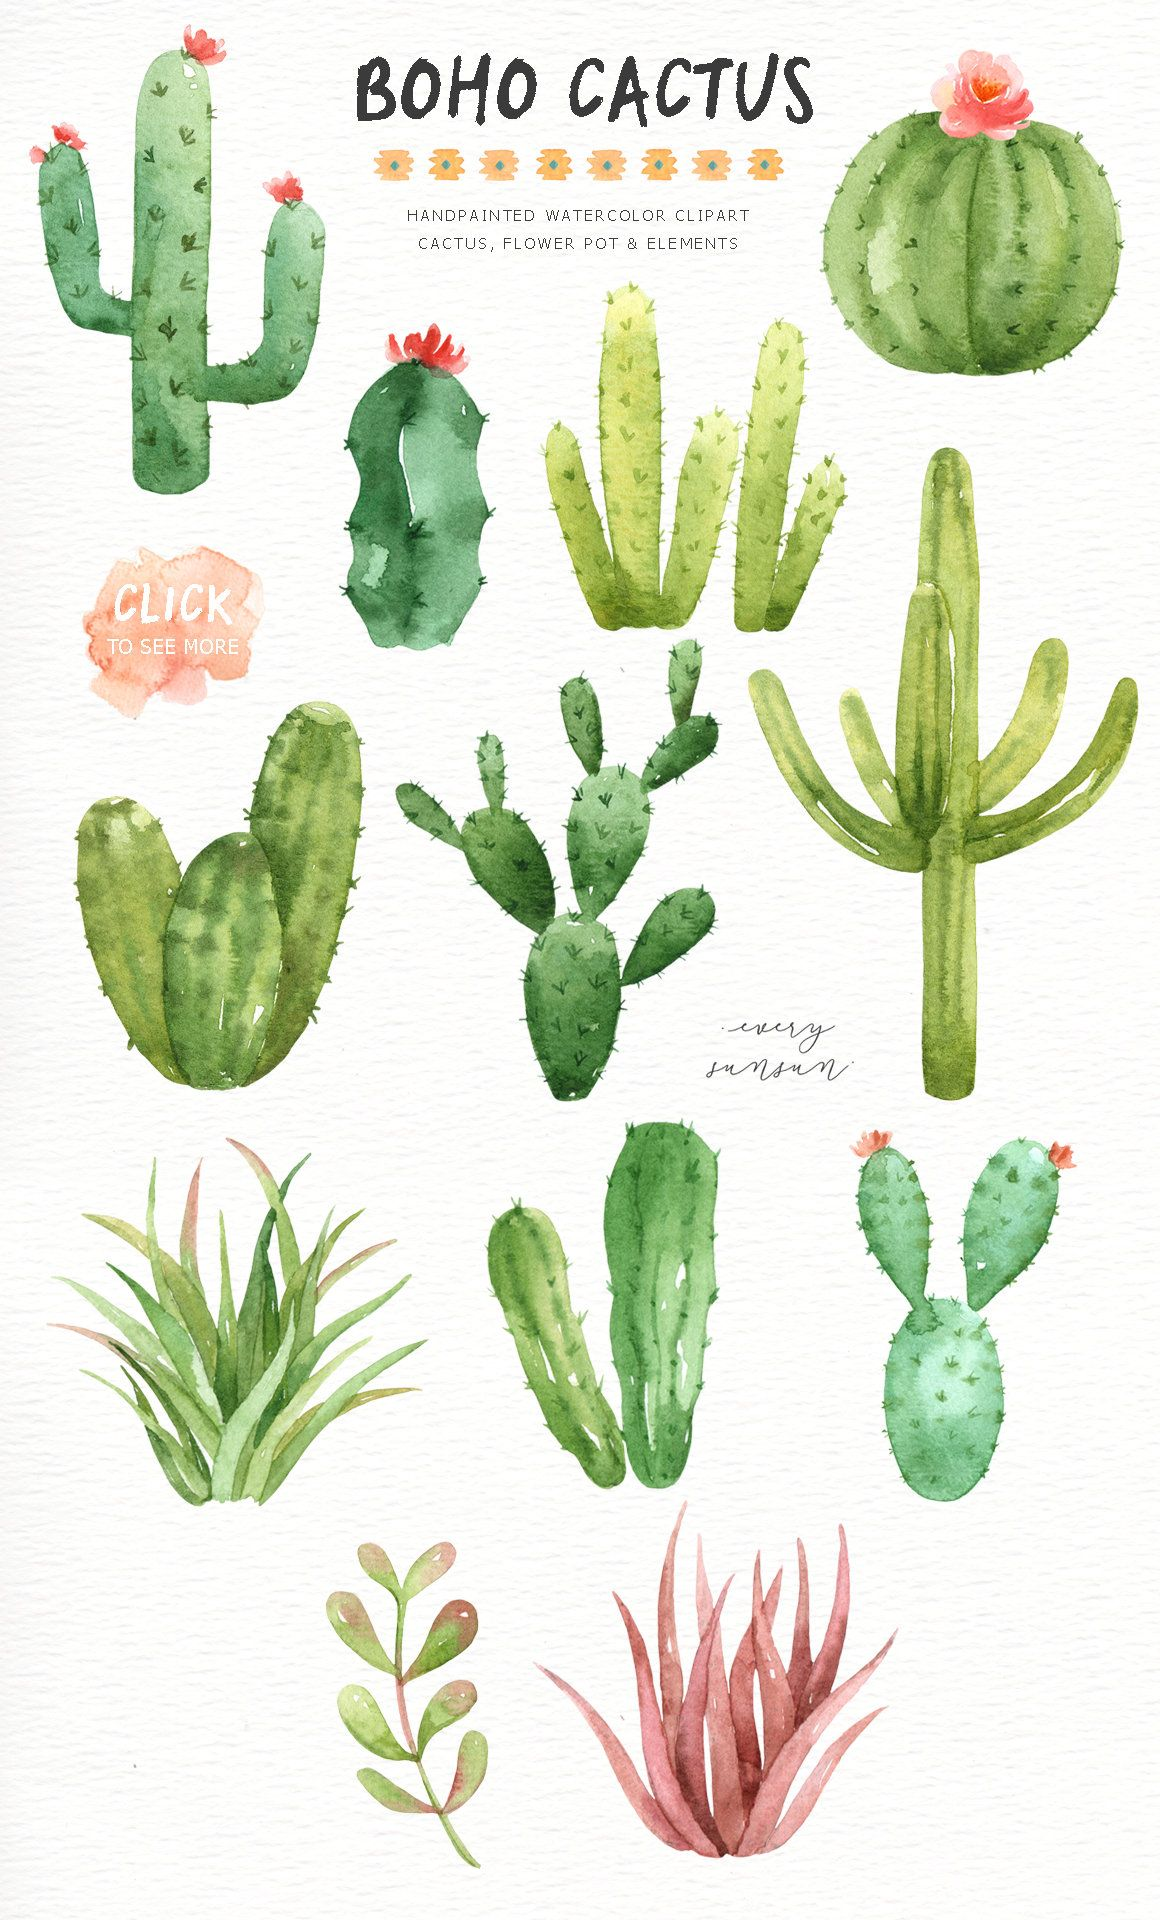 Boho cactus clipart free banner freeuse download Boho Cactus Watercolor Cliparts, Boho Clipart, Botanical Plant ... banner freeuse download